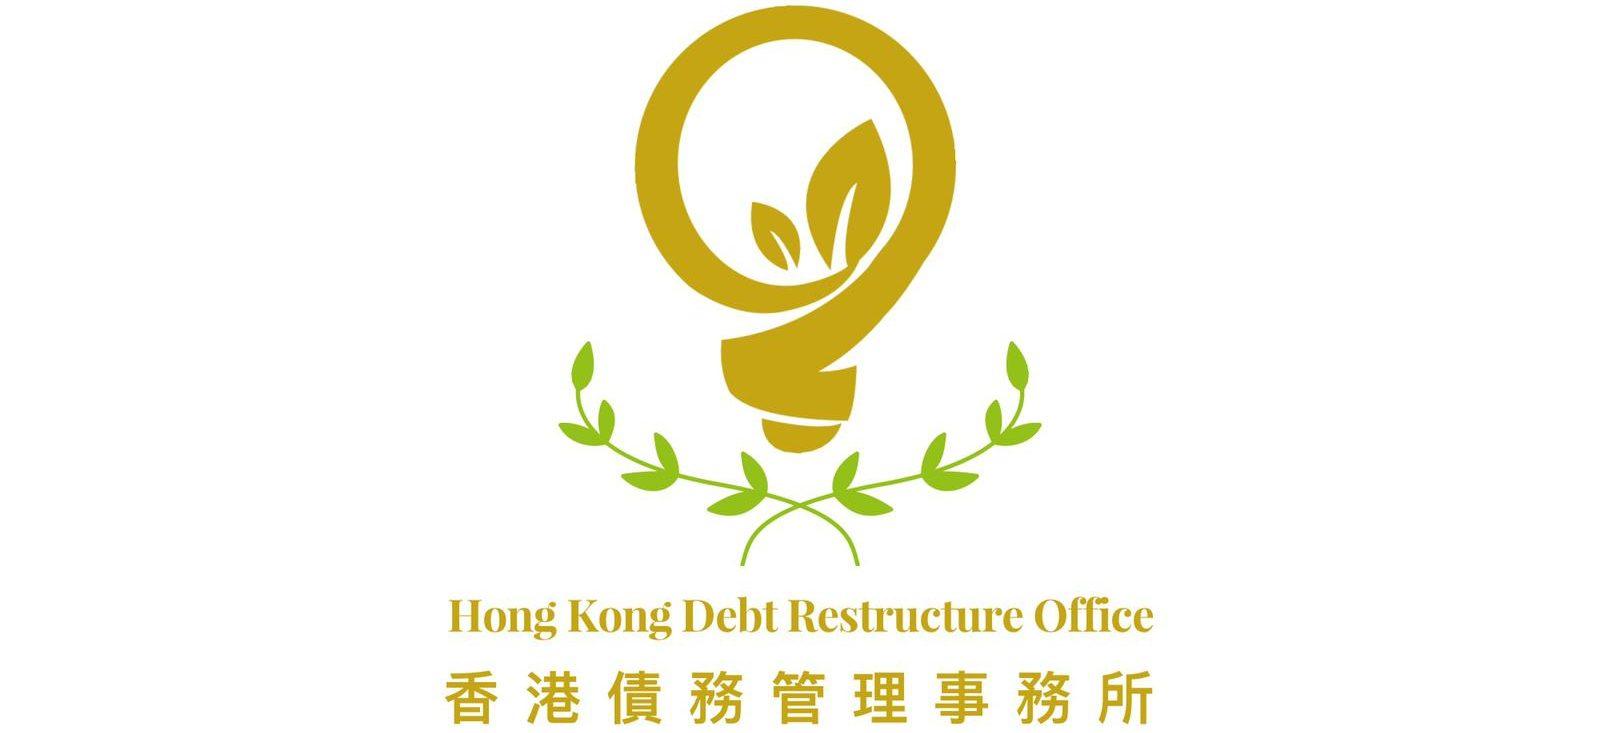 香港債務管理事務所 Hong Kong Debt Restructure Office